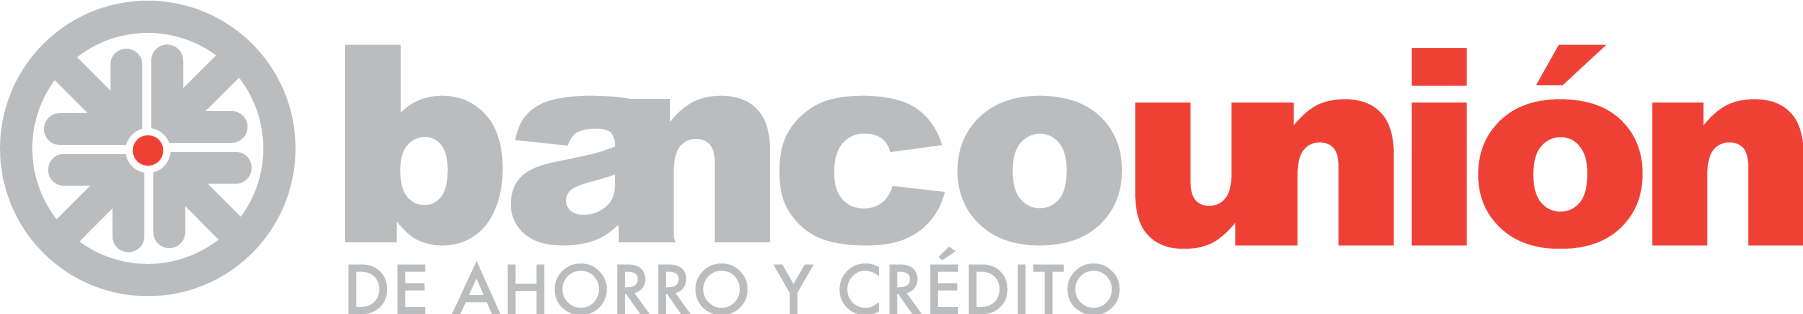 Partners - image banco-union-logo on https://gcs-international.com